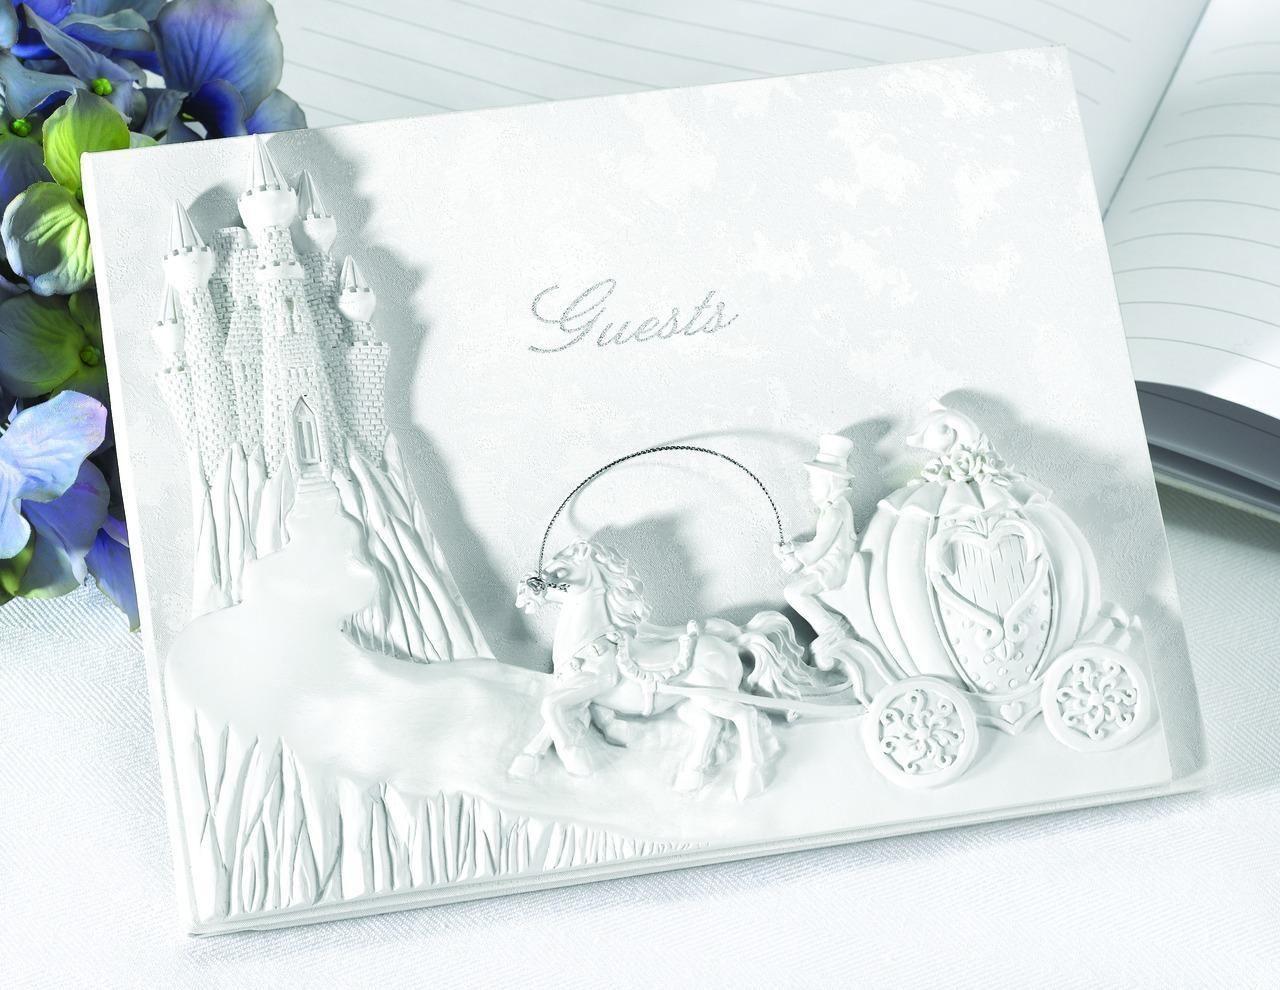 Cinderella Guest Book: 1 listing